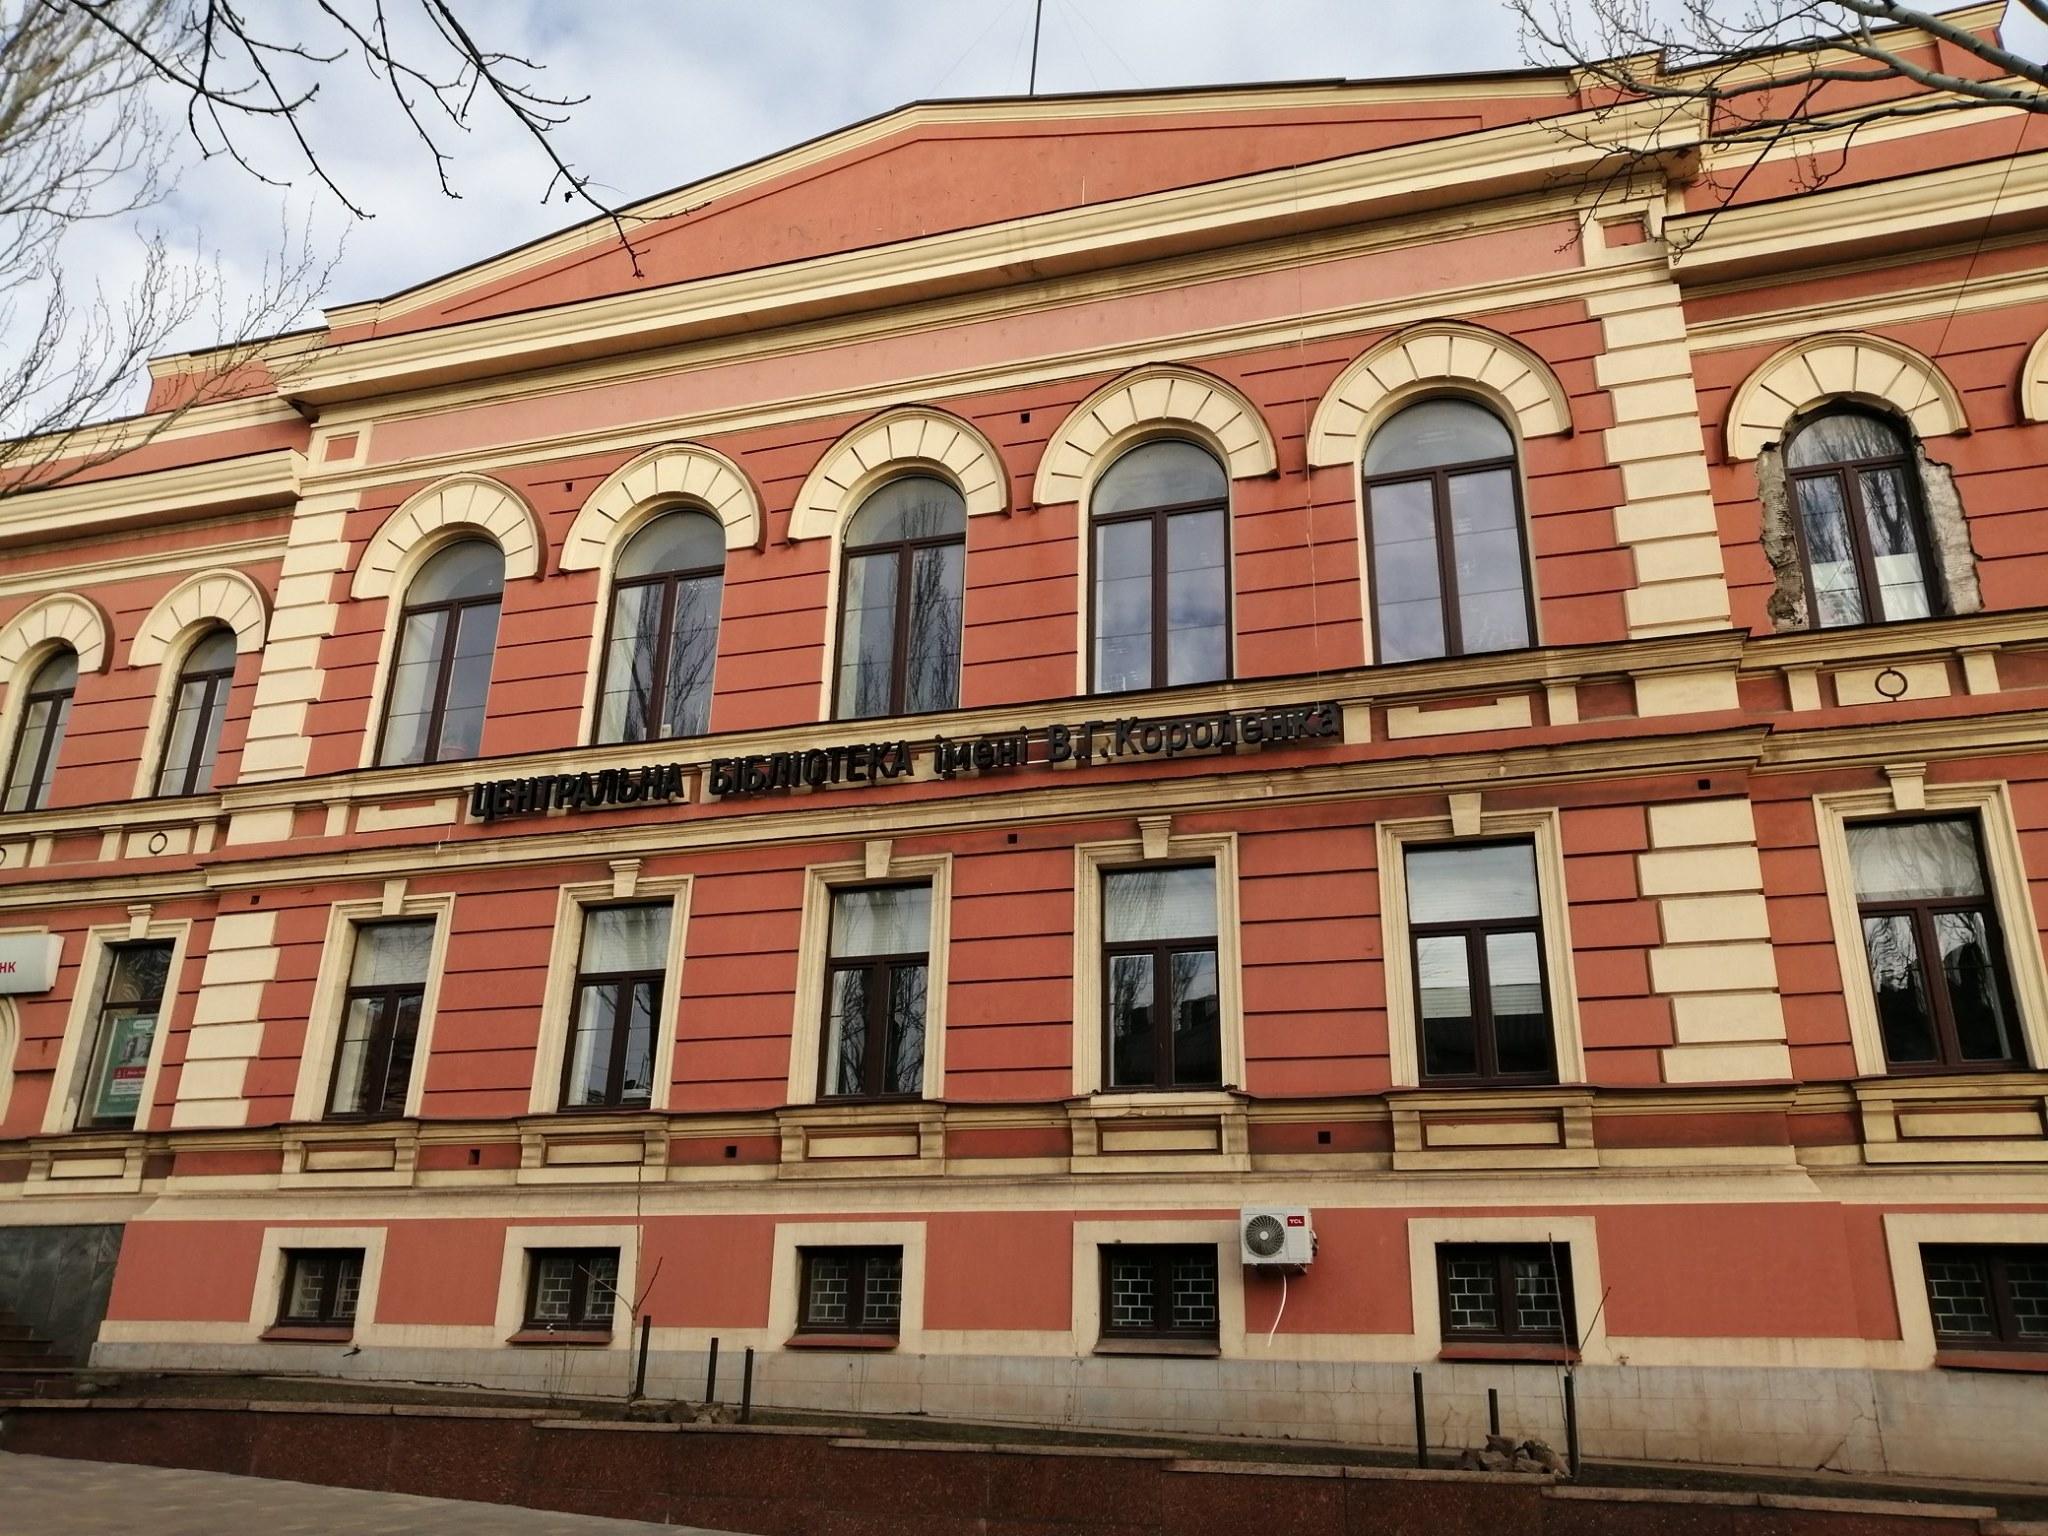 Центральна міська бібліотека ім. Короленка